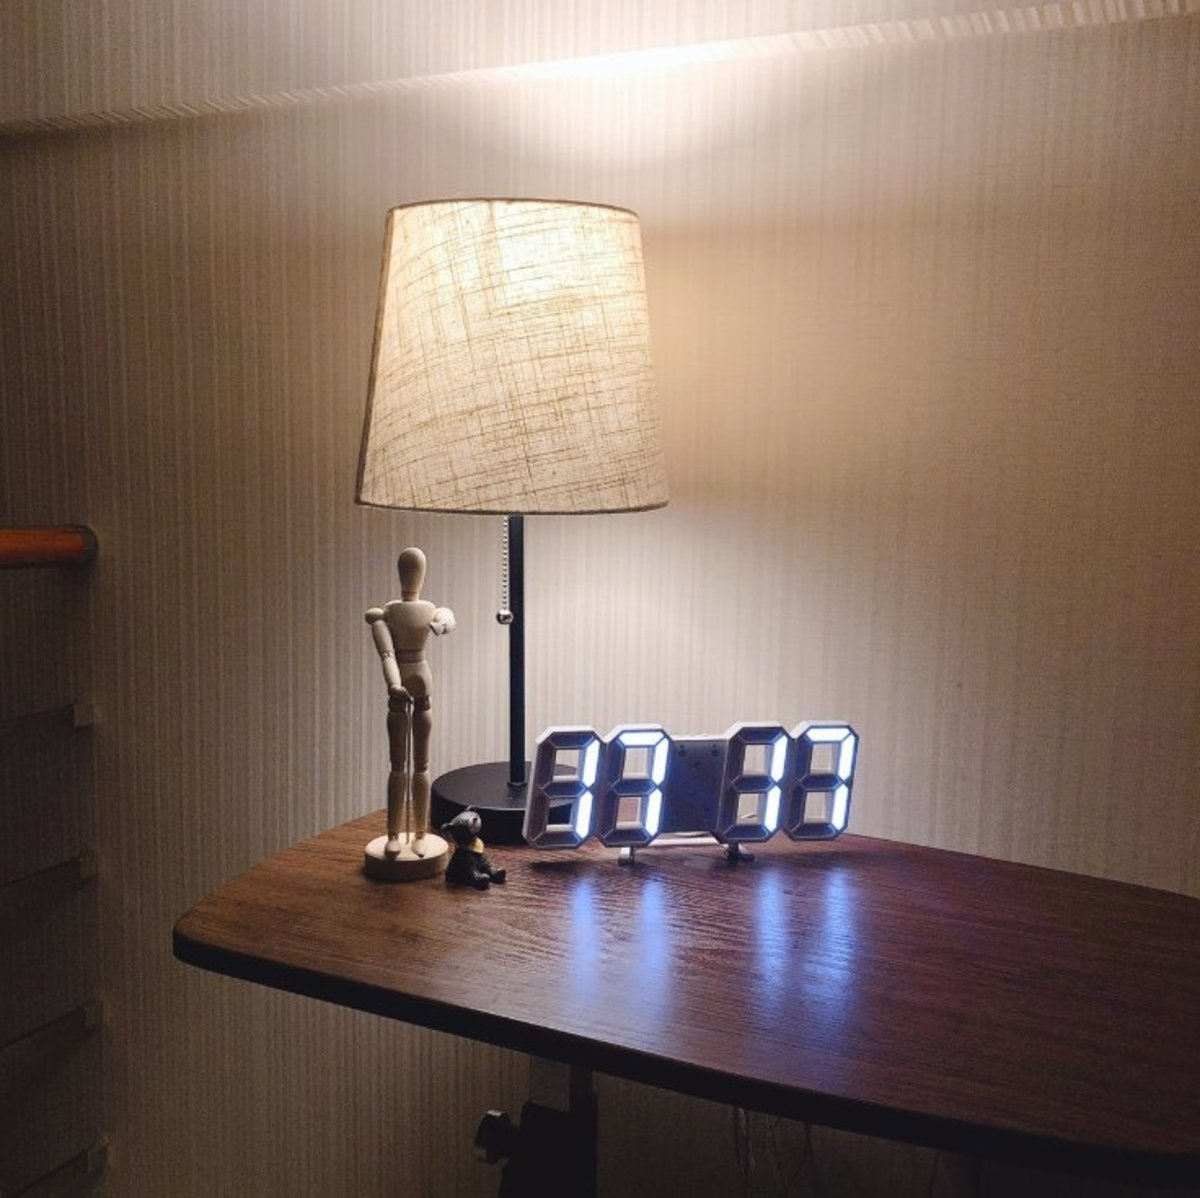 (White Light) Creative USB LED Digital Wall/Table Alarm Clock